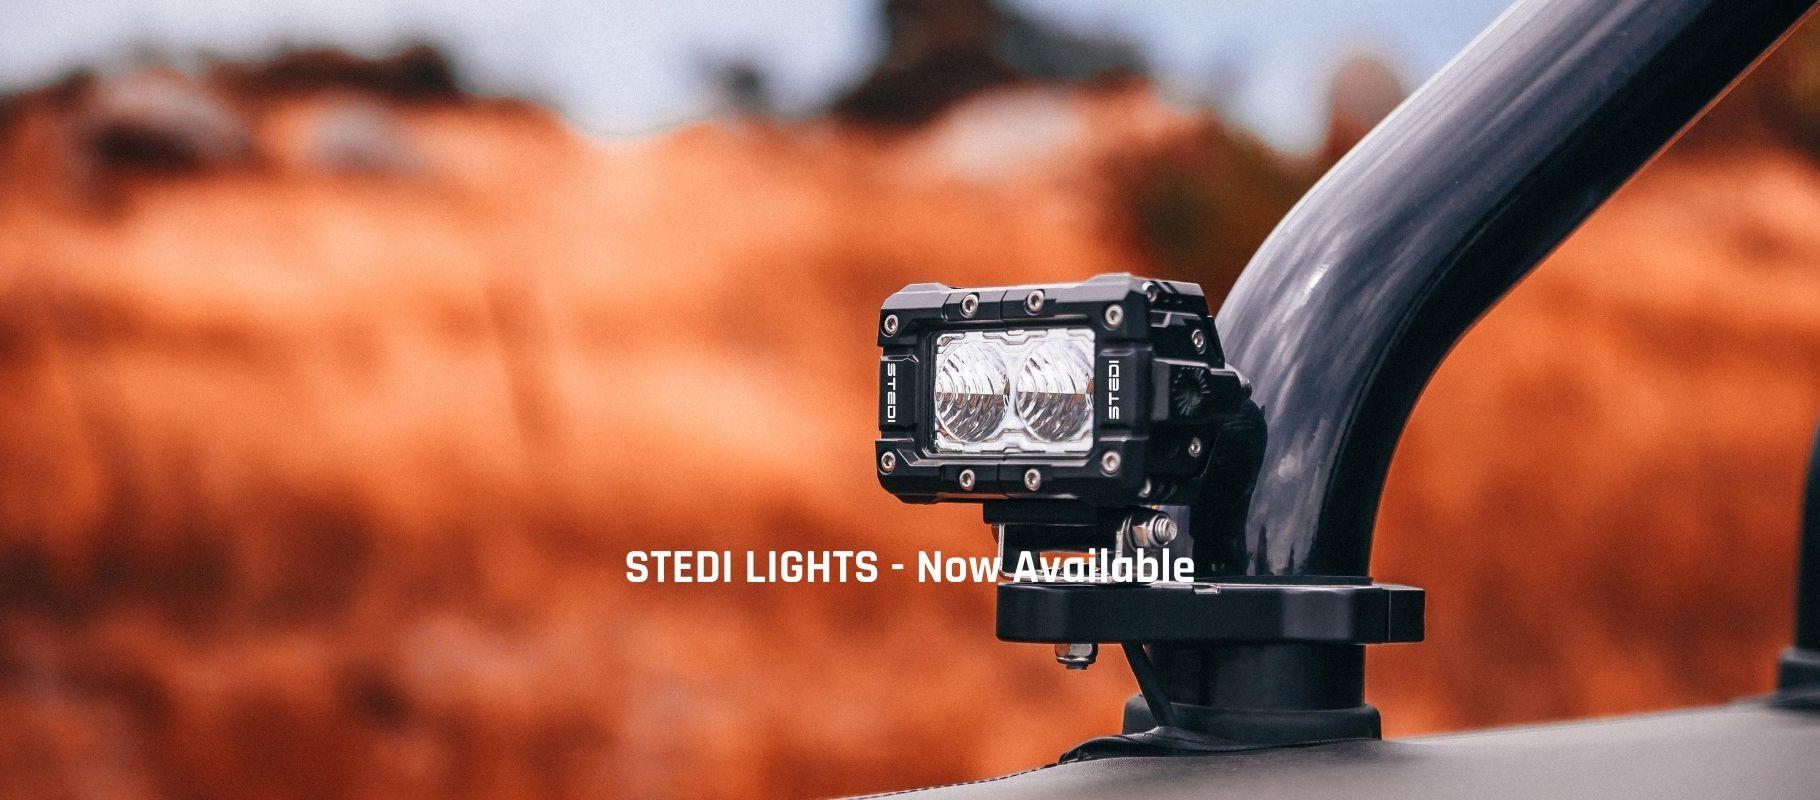 Buy STEDI LED lights at Perth WA